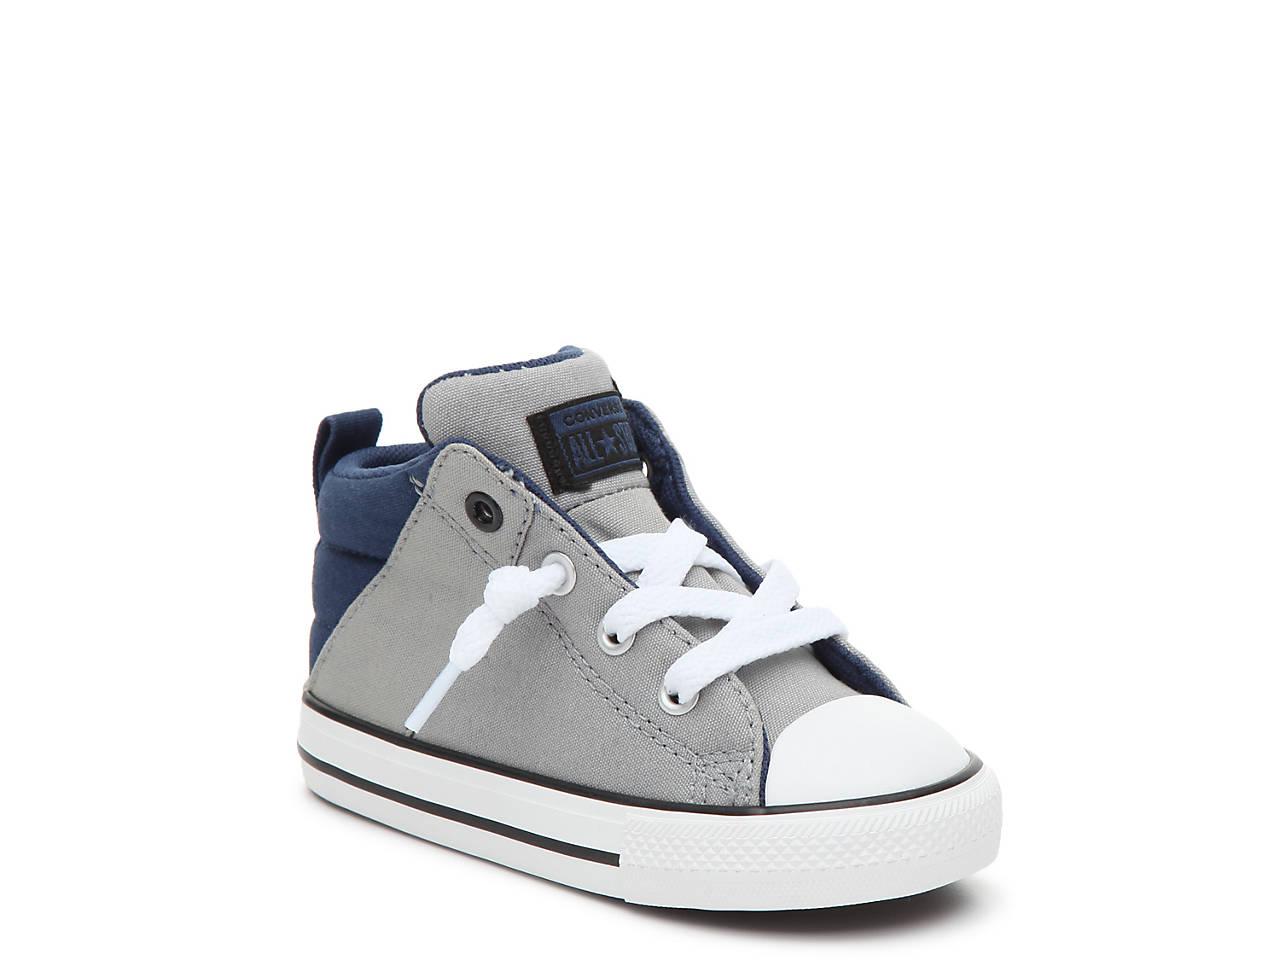 Converse Chuck Taylor All Star Axel Slip On Sneaker Kids